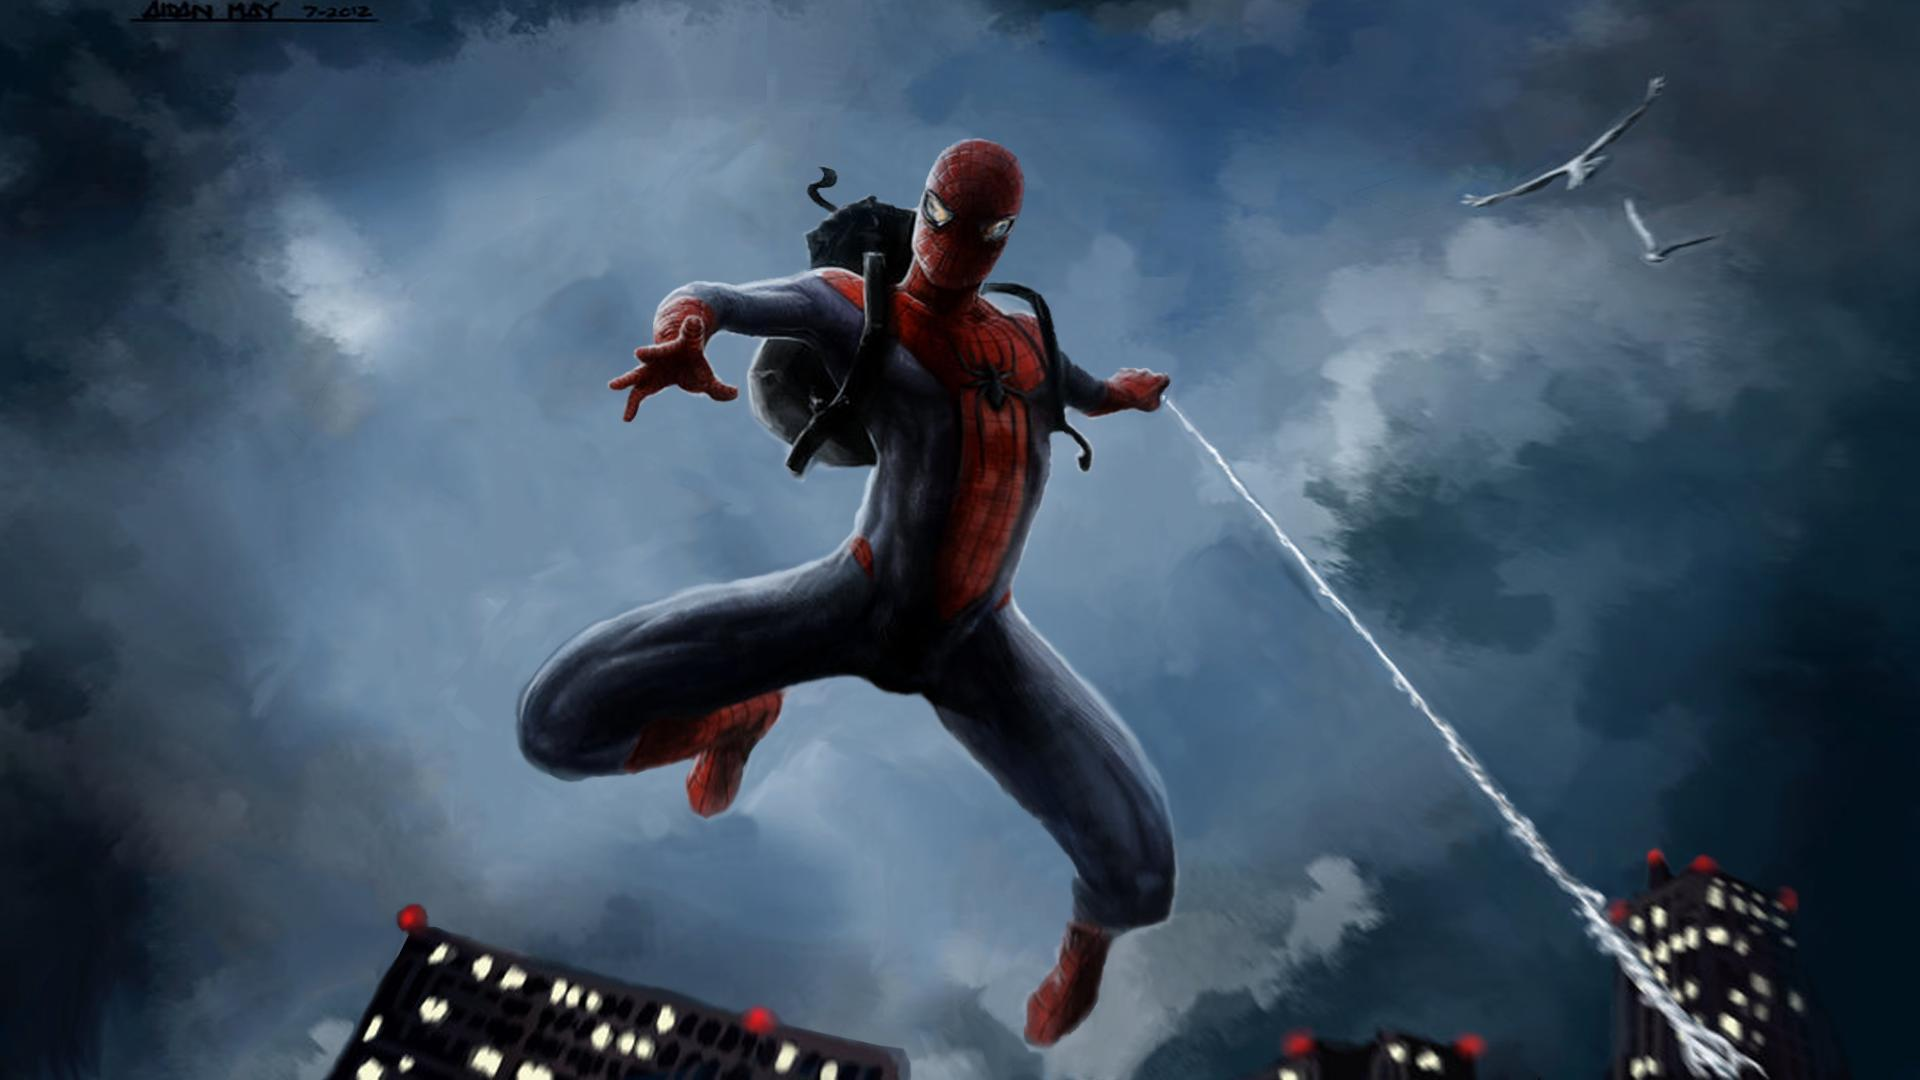 HD Spiderman Wallpapers - Wallpaper Cave